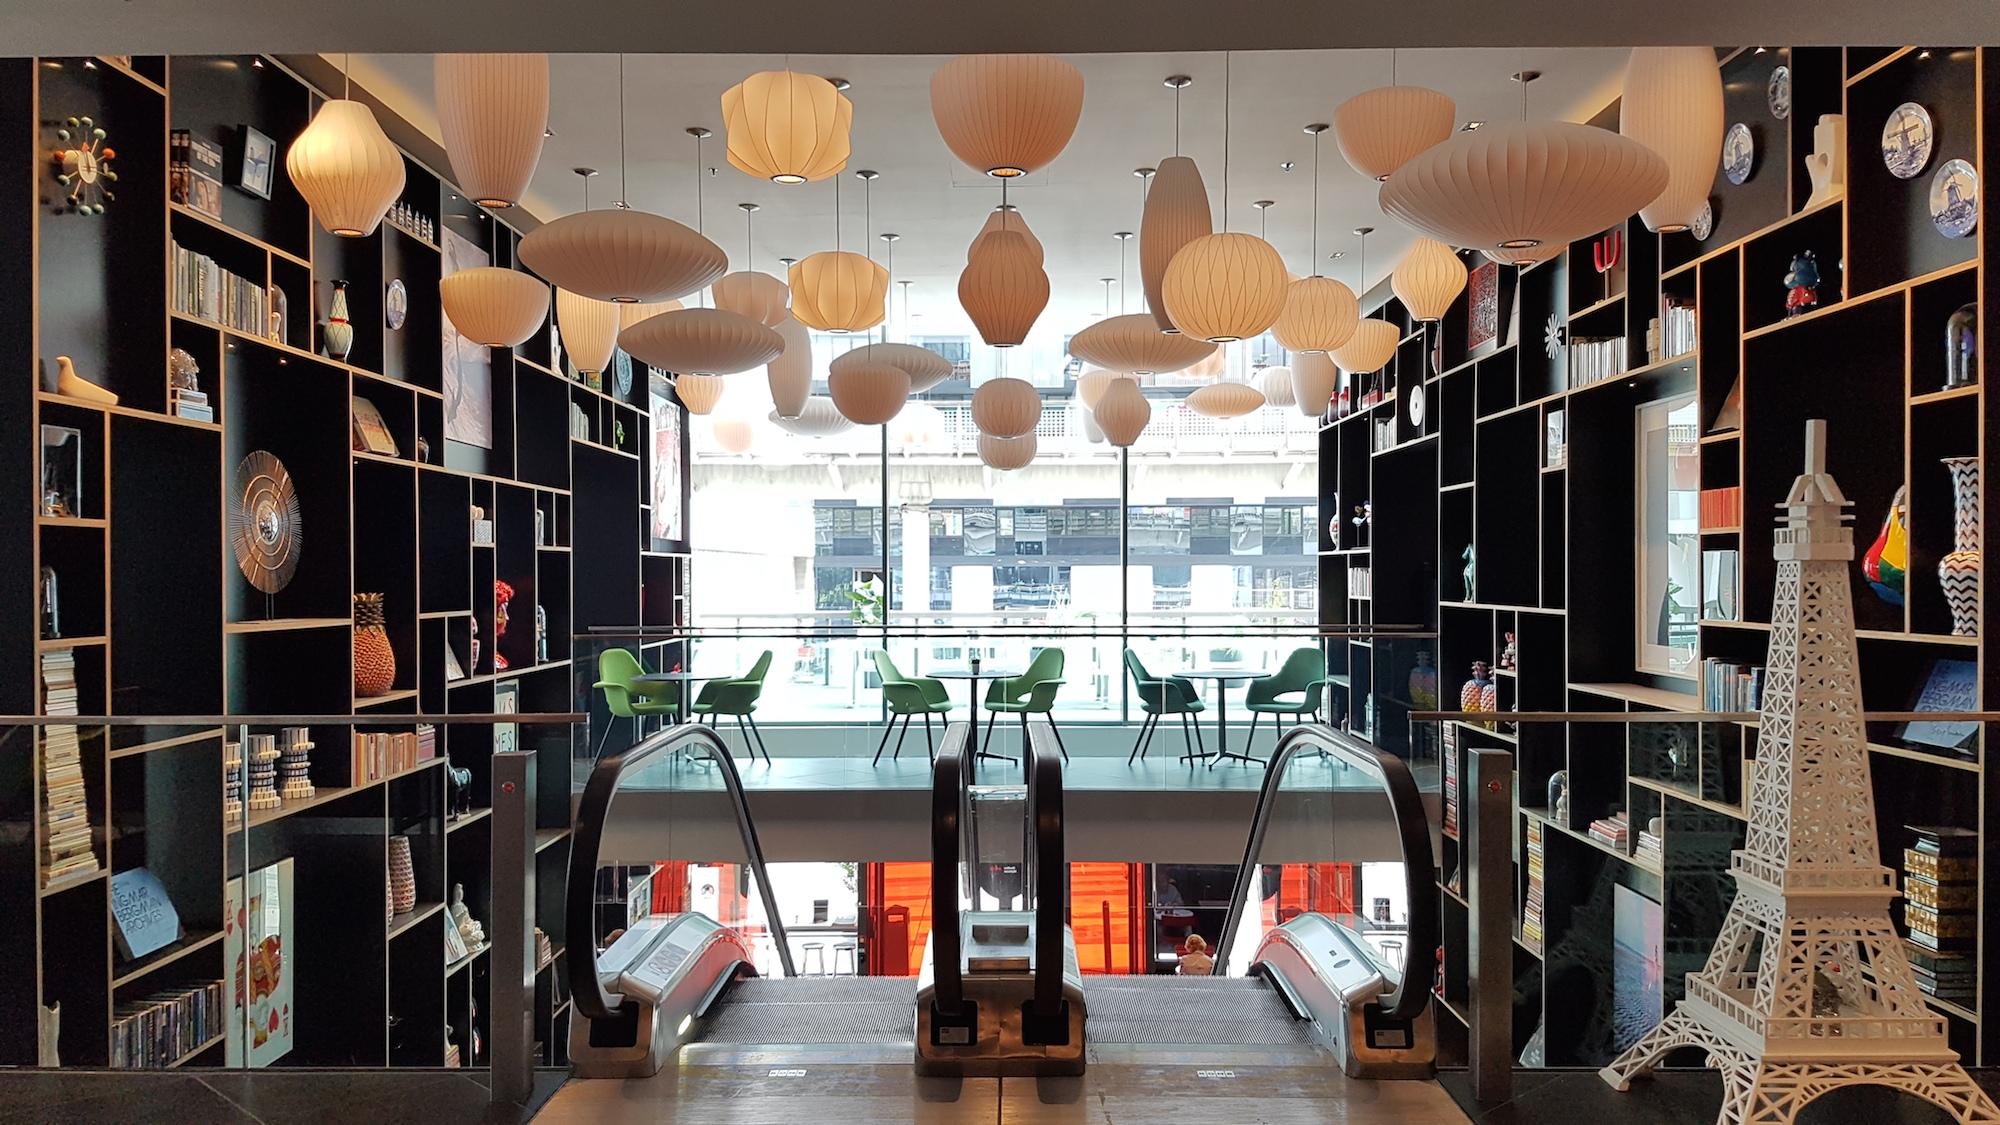 HiP Paris Blog checks out citizenM hotel